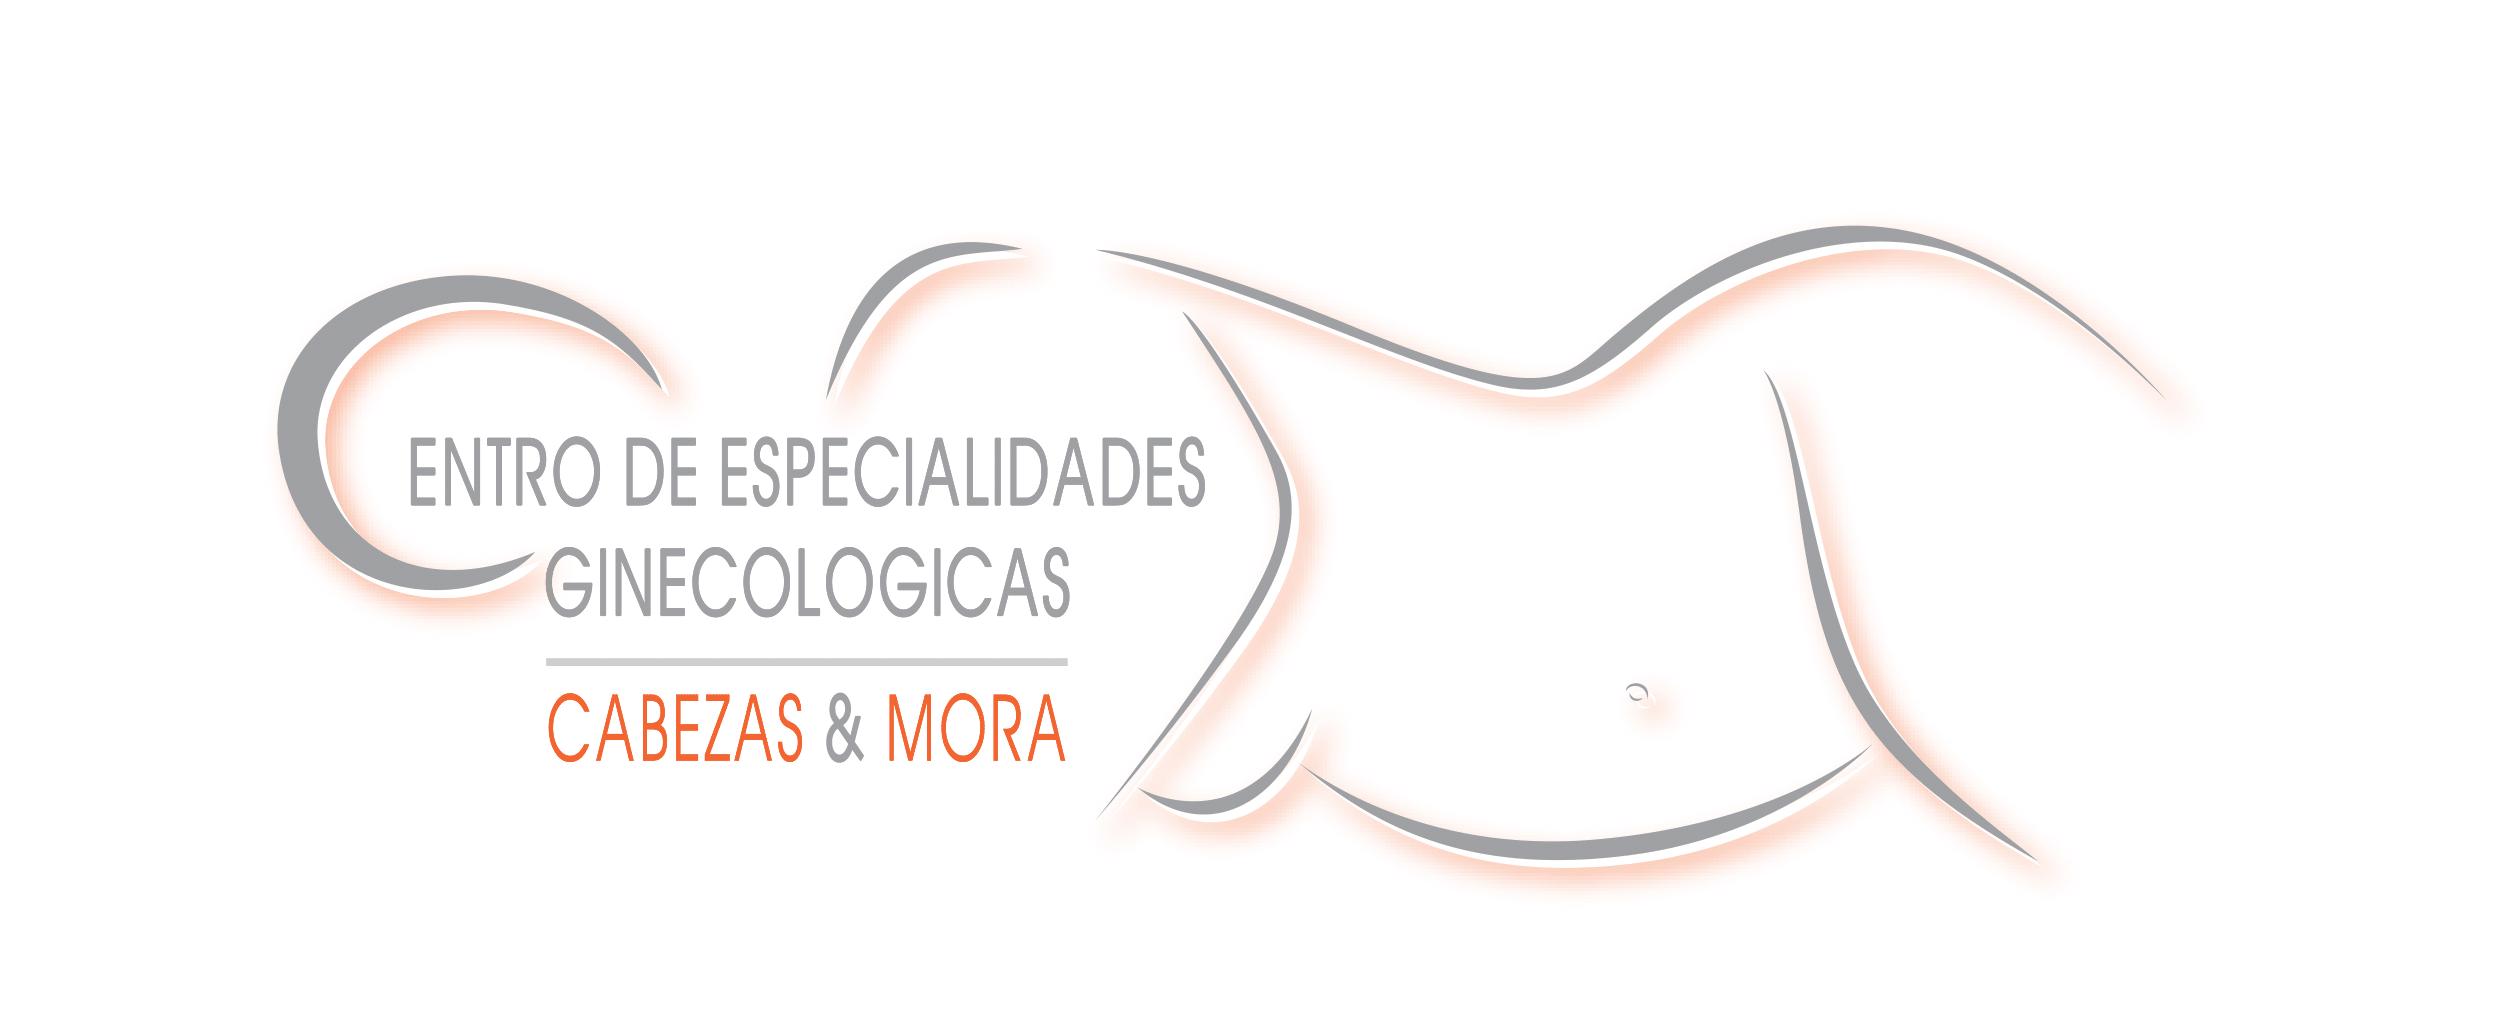 LOGO CABEZAS & MORA.ai (2)-1